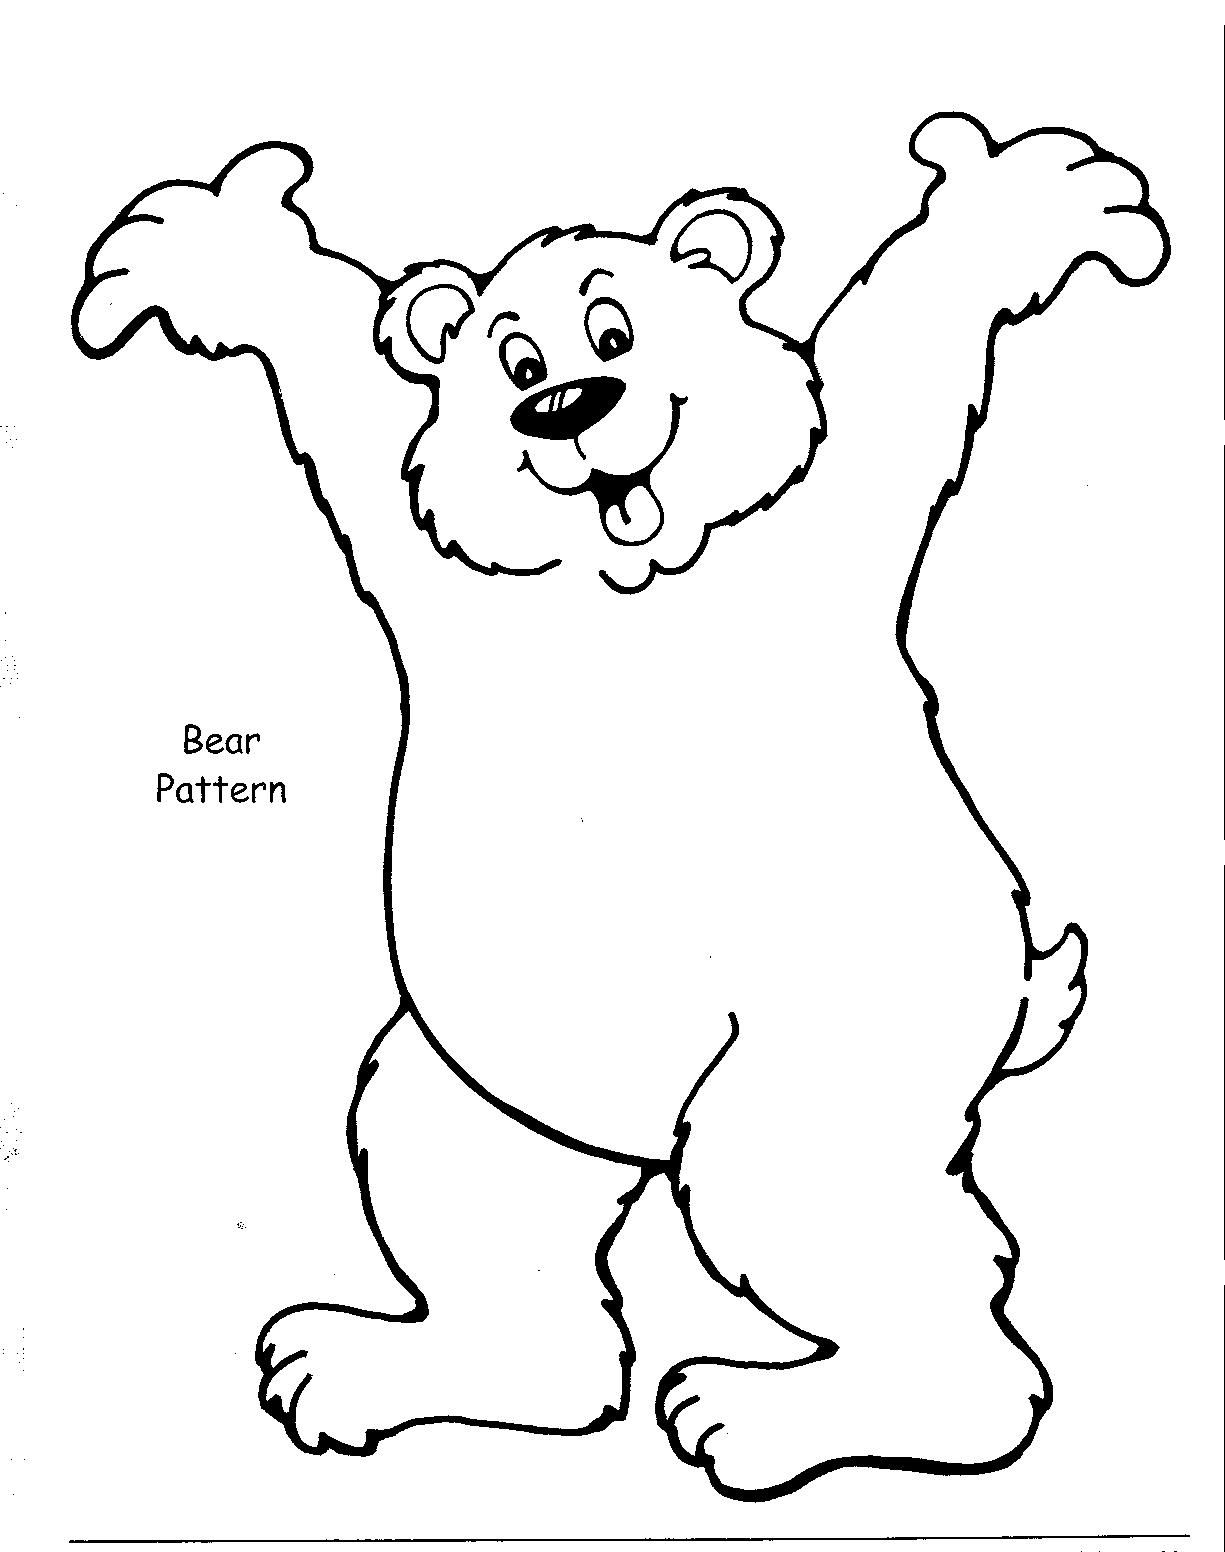 Brilliant Beginnings Preschool Printables Bear coloring